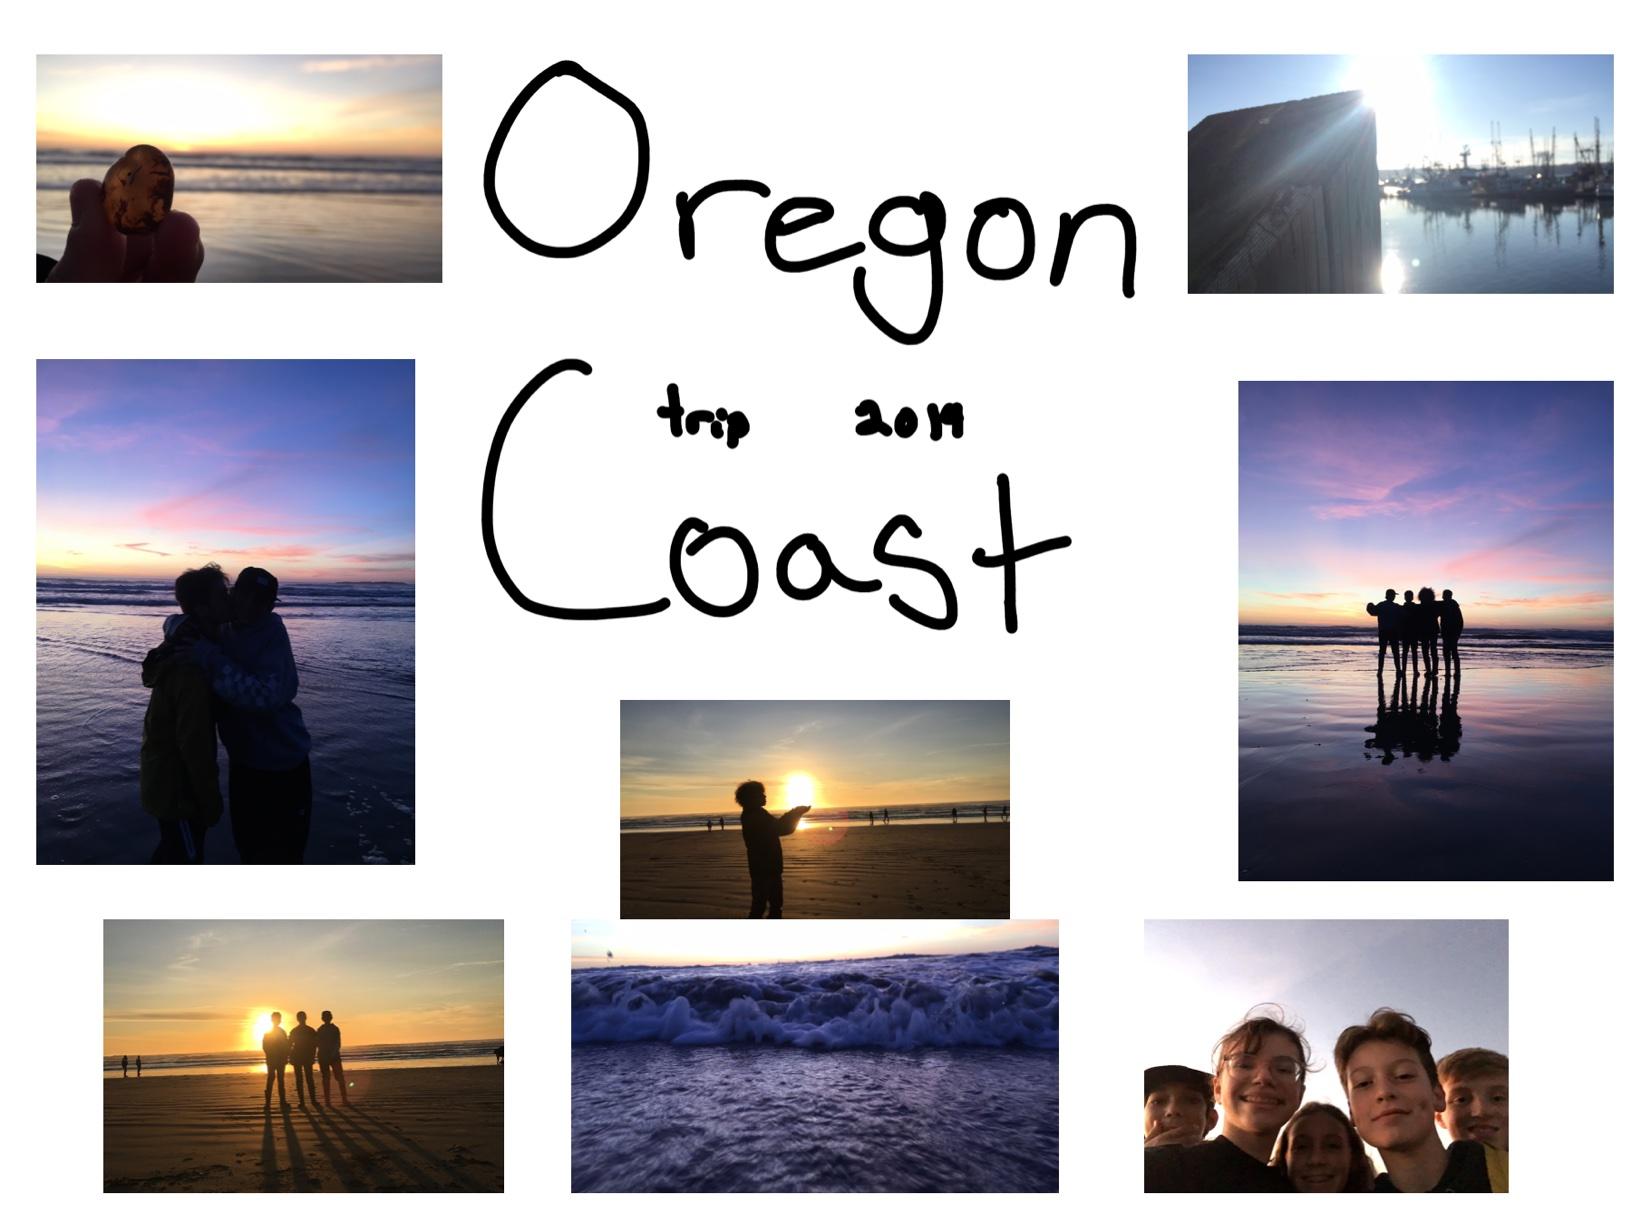 Oregon Coast Trip 2019